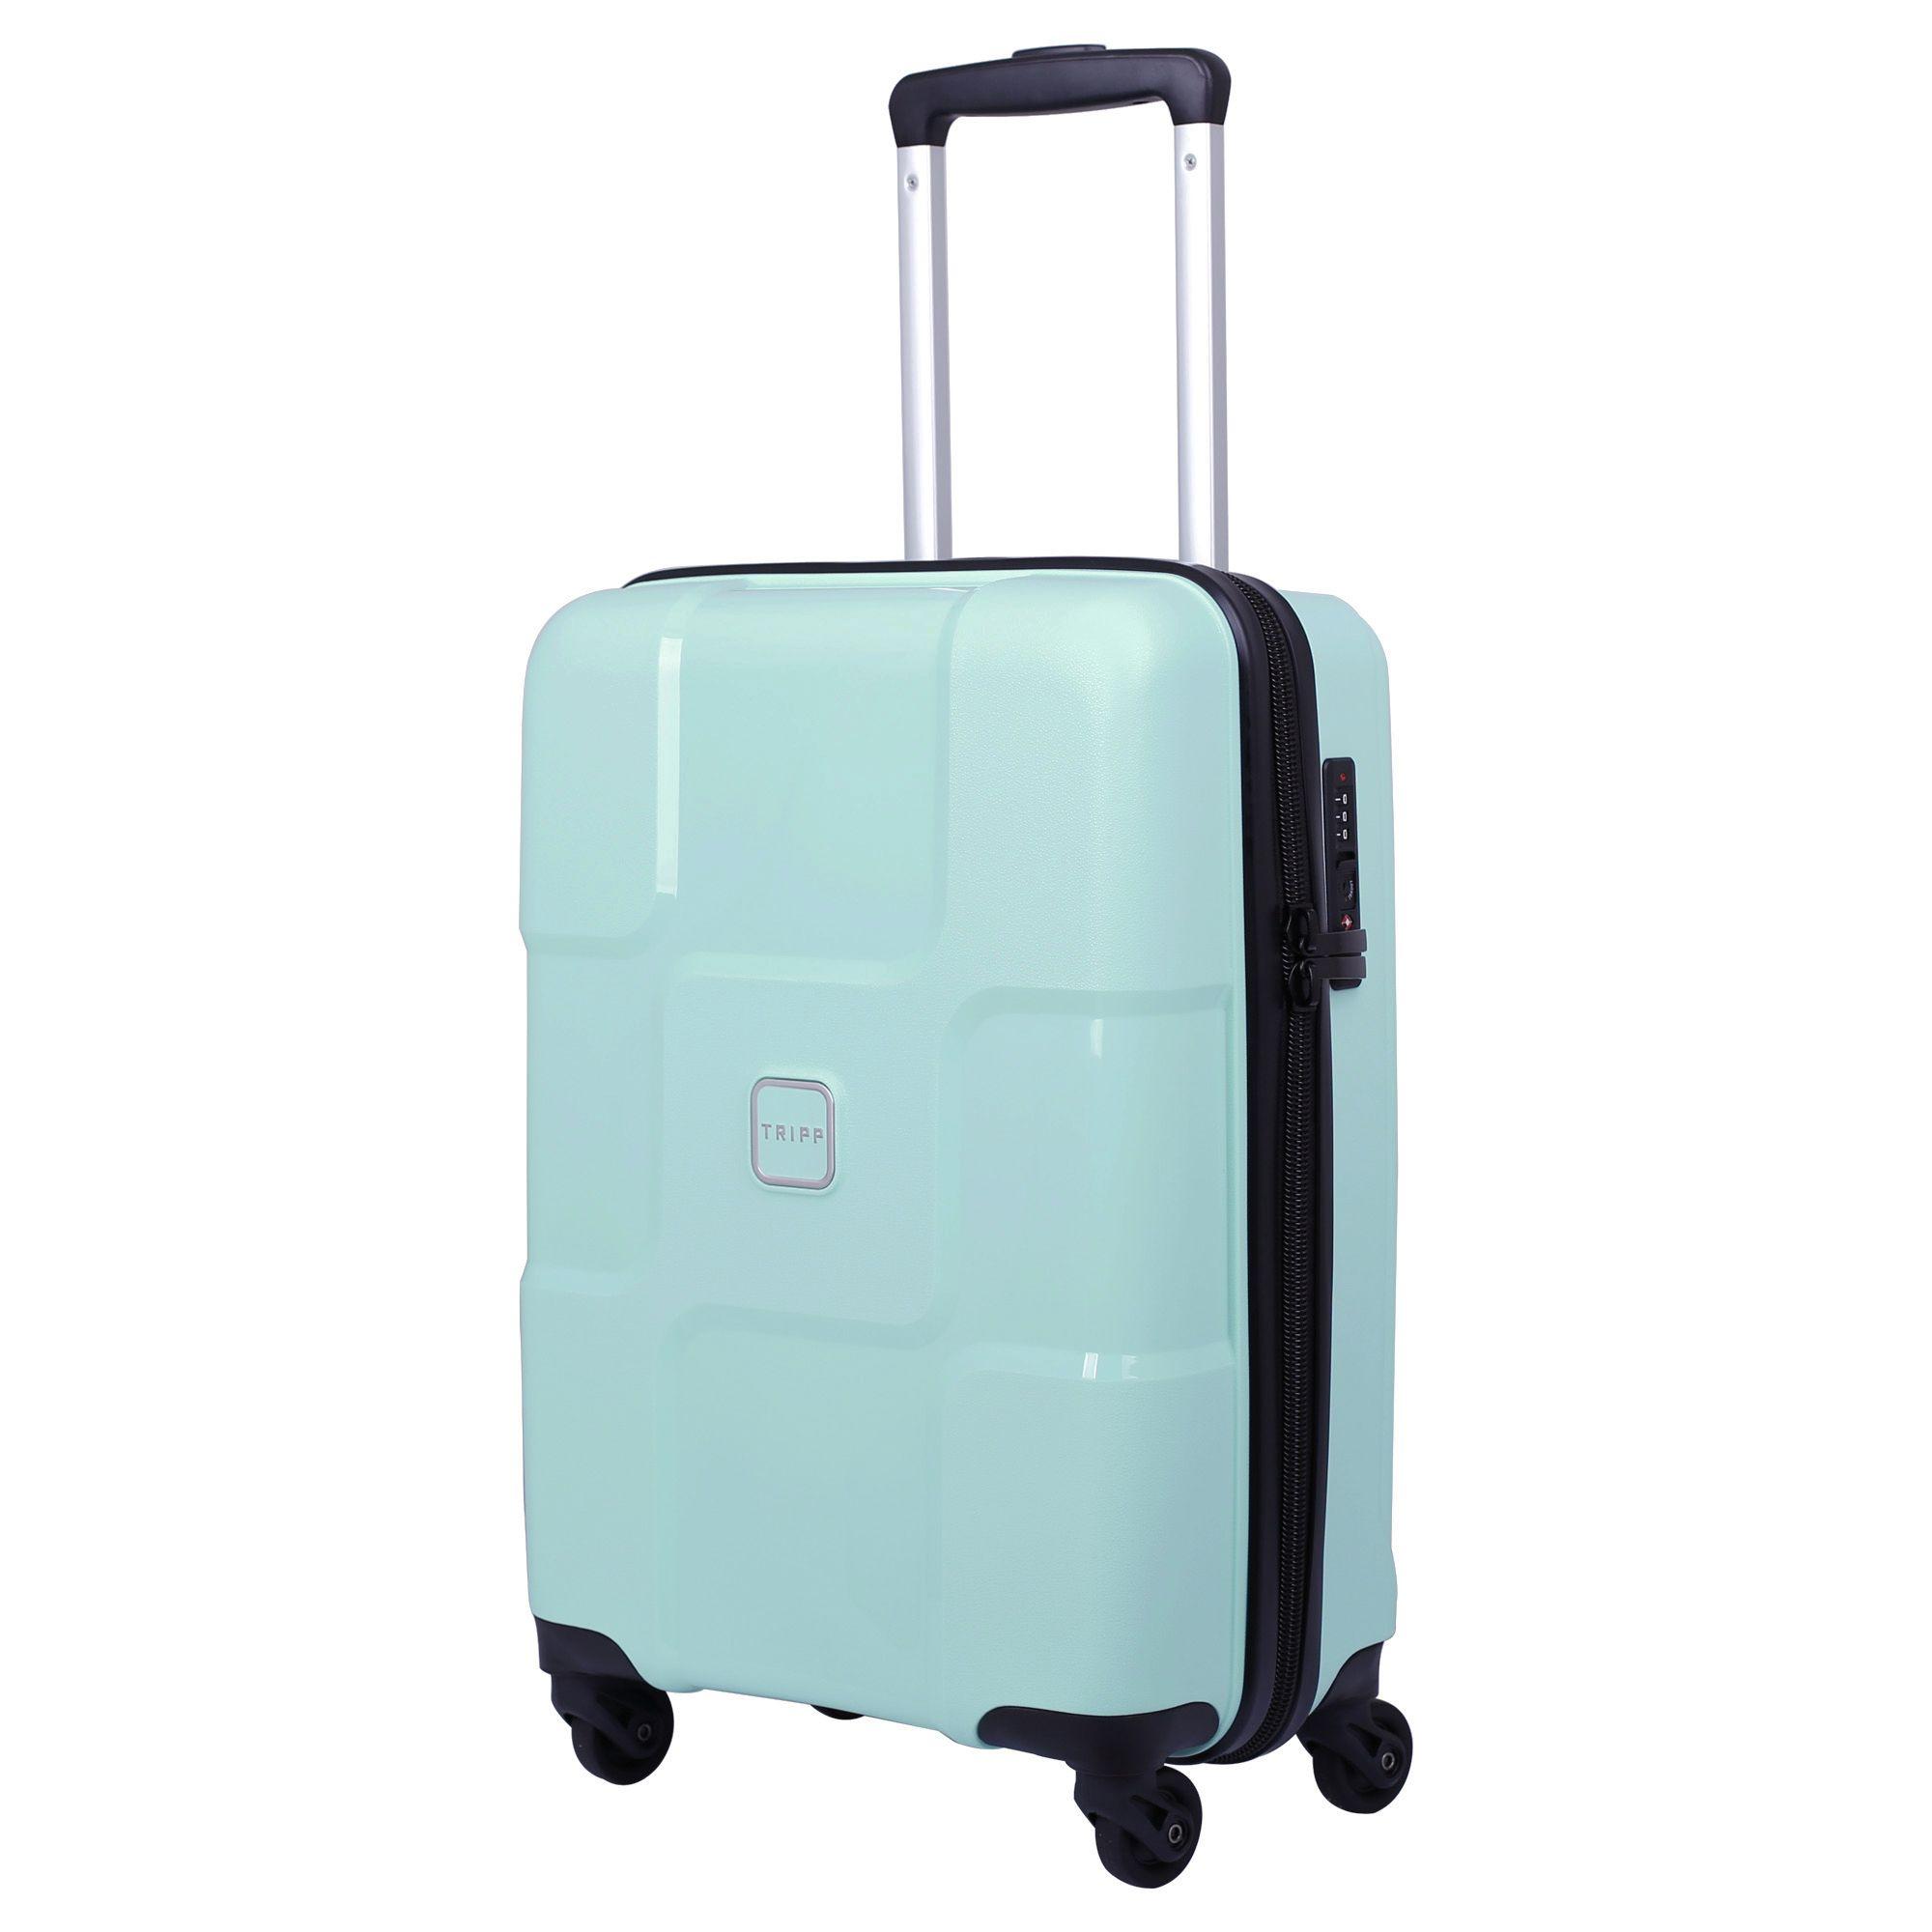 tripp aqua 39 world 39 cabin 4 wheel suitcase hard suitcases. Black Bedroom Furniture Sets. Home Design Ideas